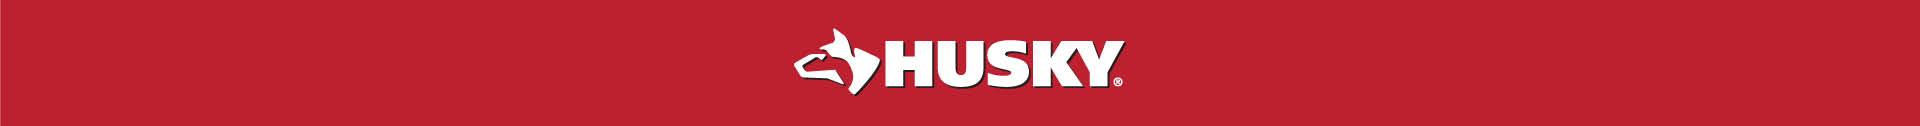 Husky Banner